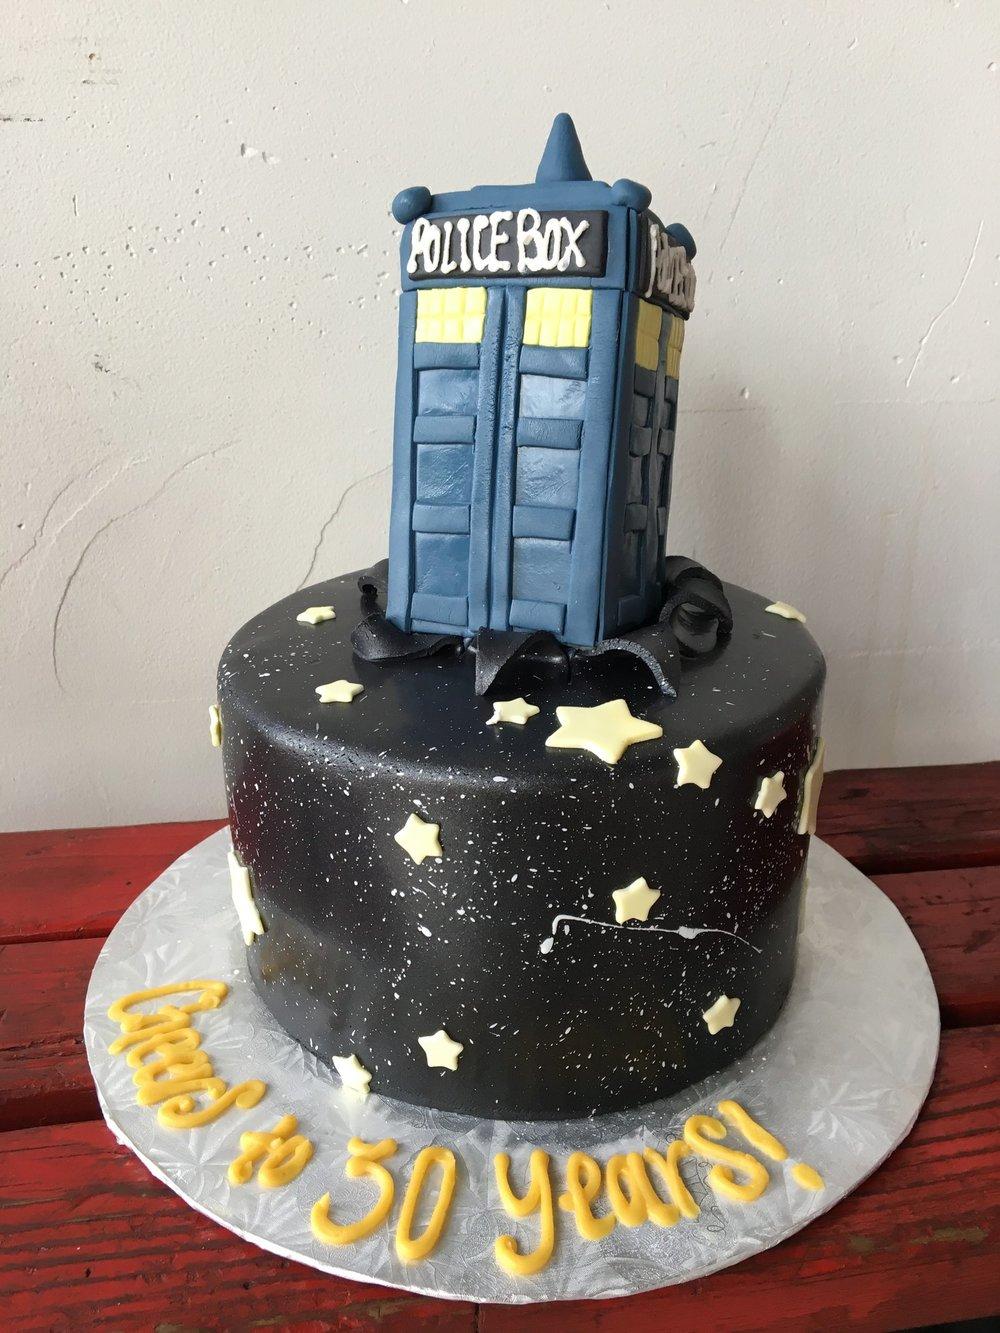 dr who theme cake.jpg